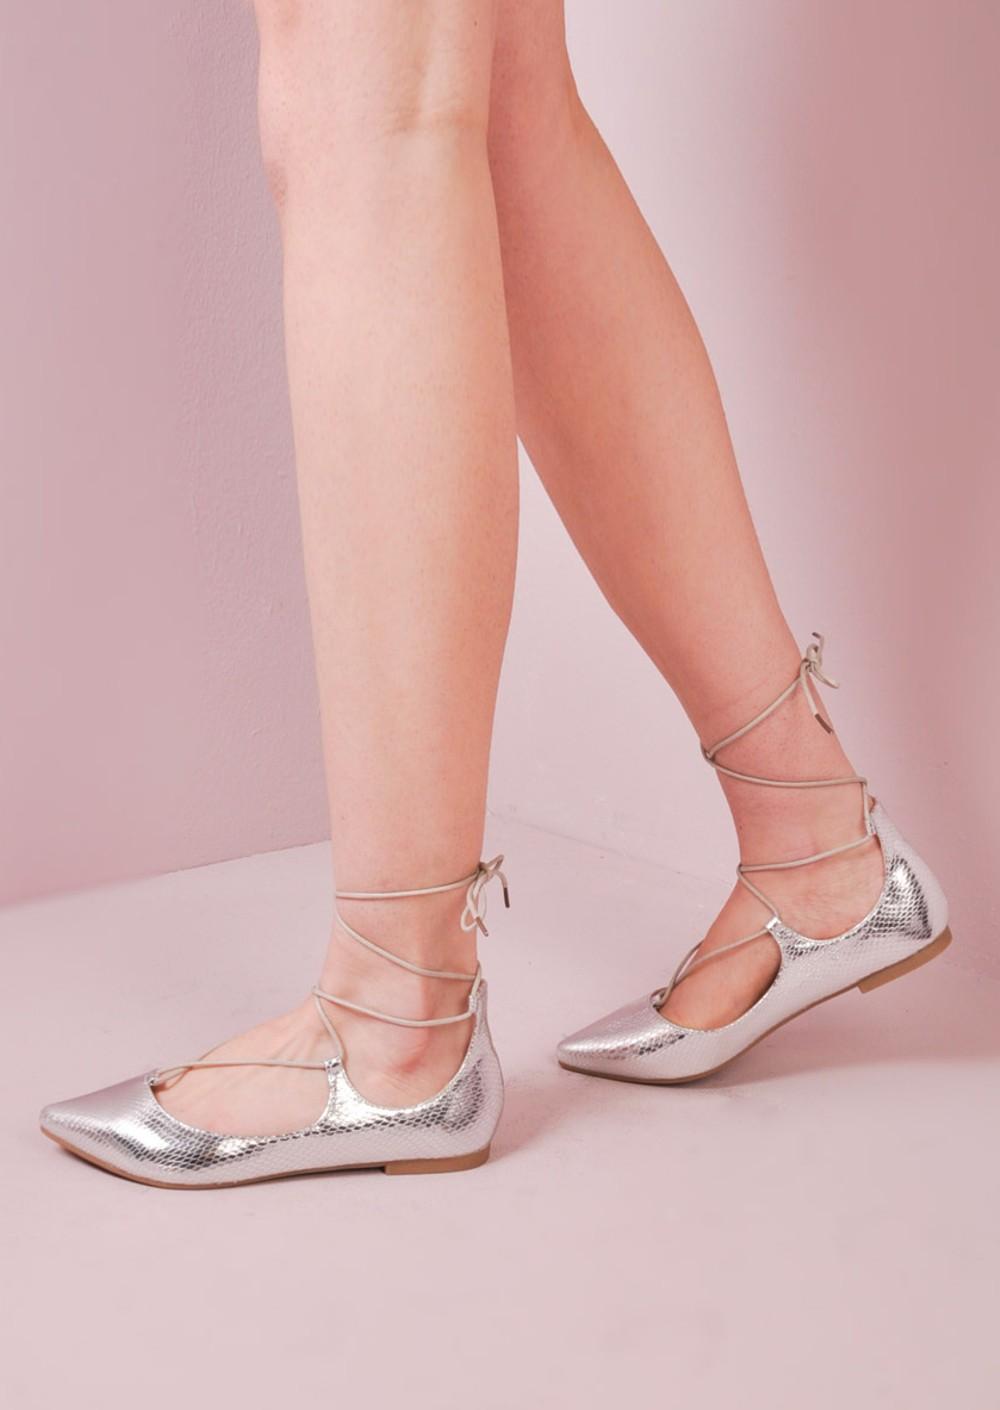 Pointed Toe Ballerina Shoes Uk